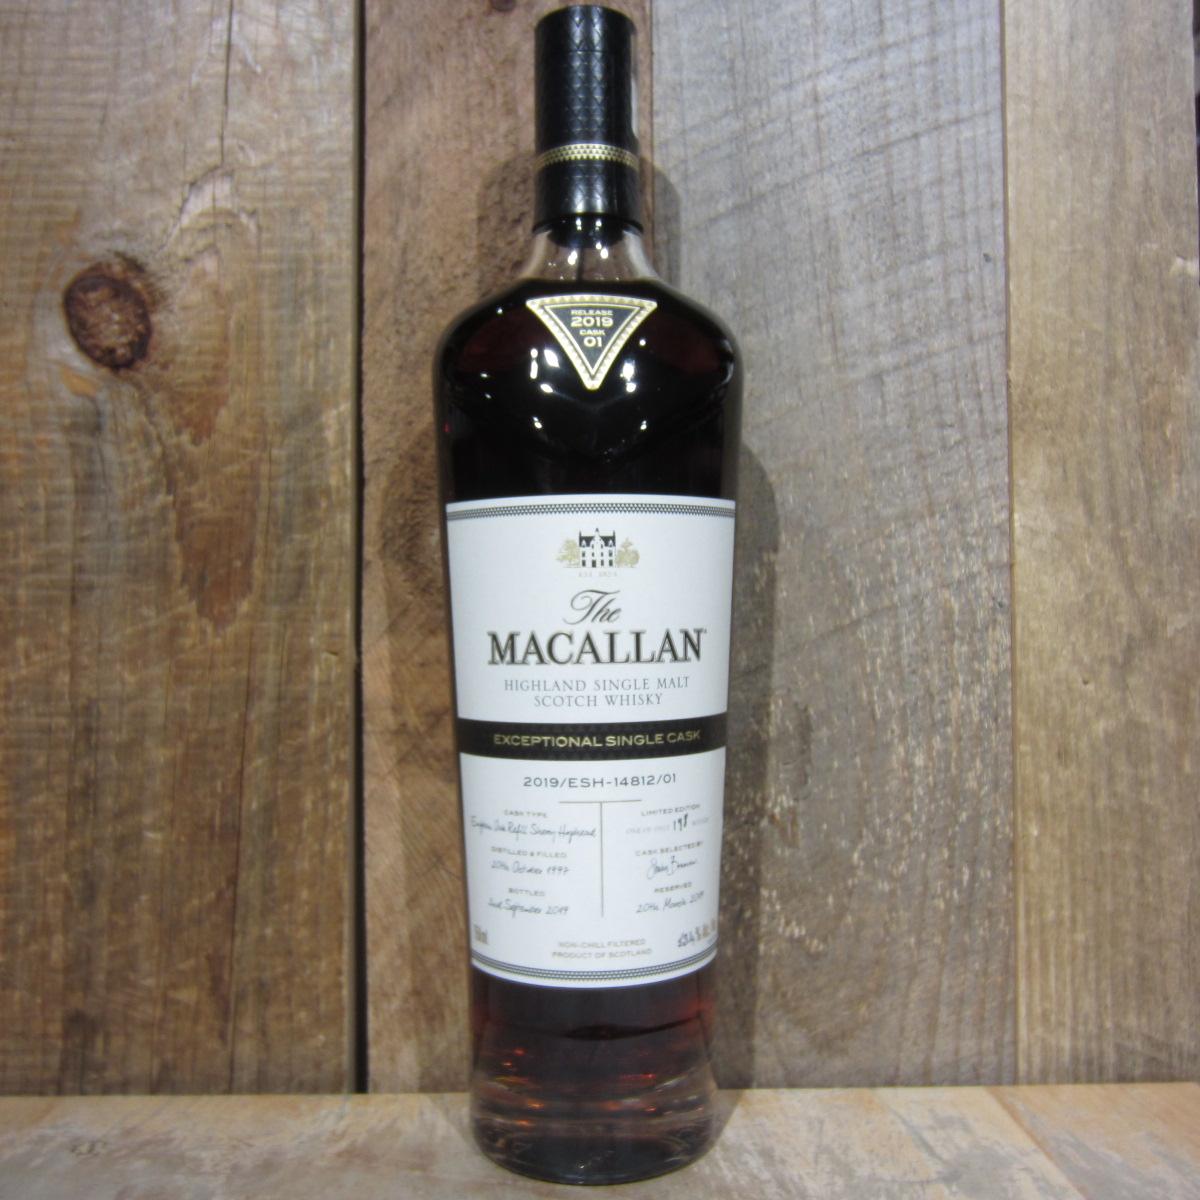 Macallan Exceptional Single Cask 14812 106.8pf 750ml